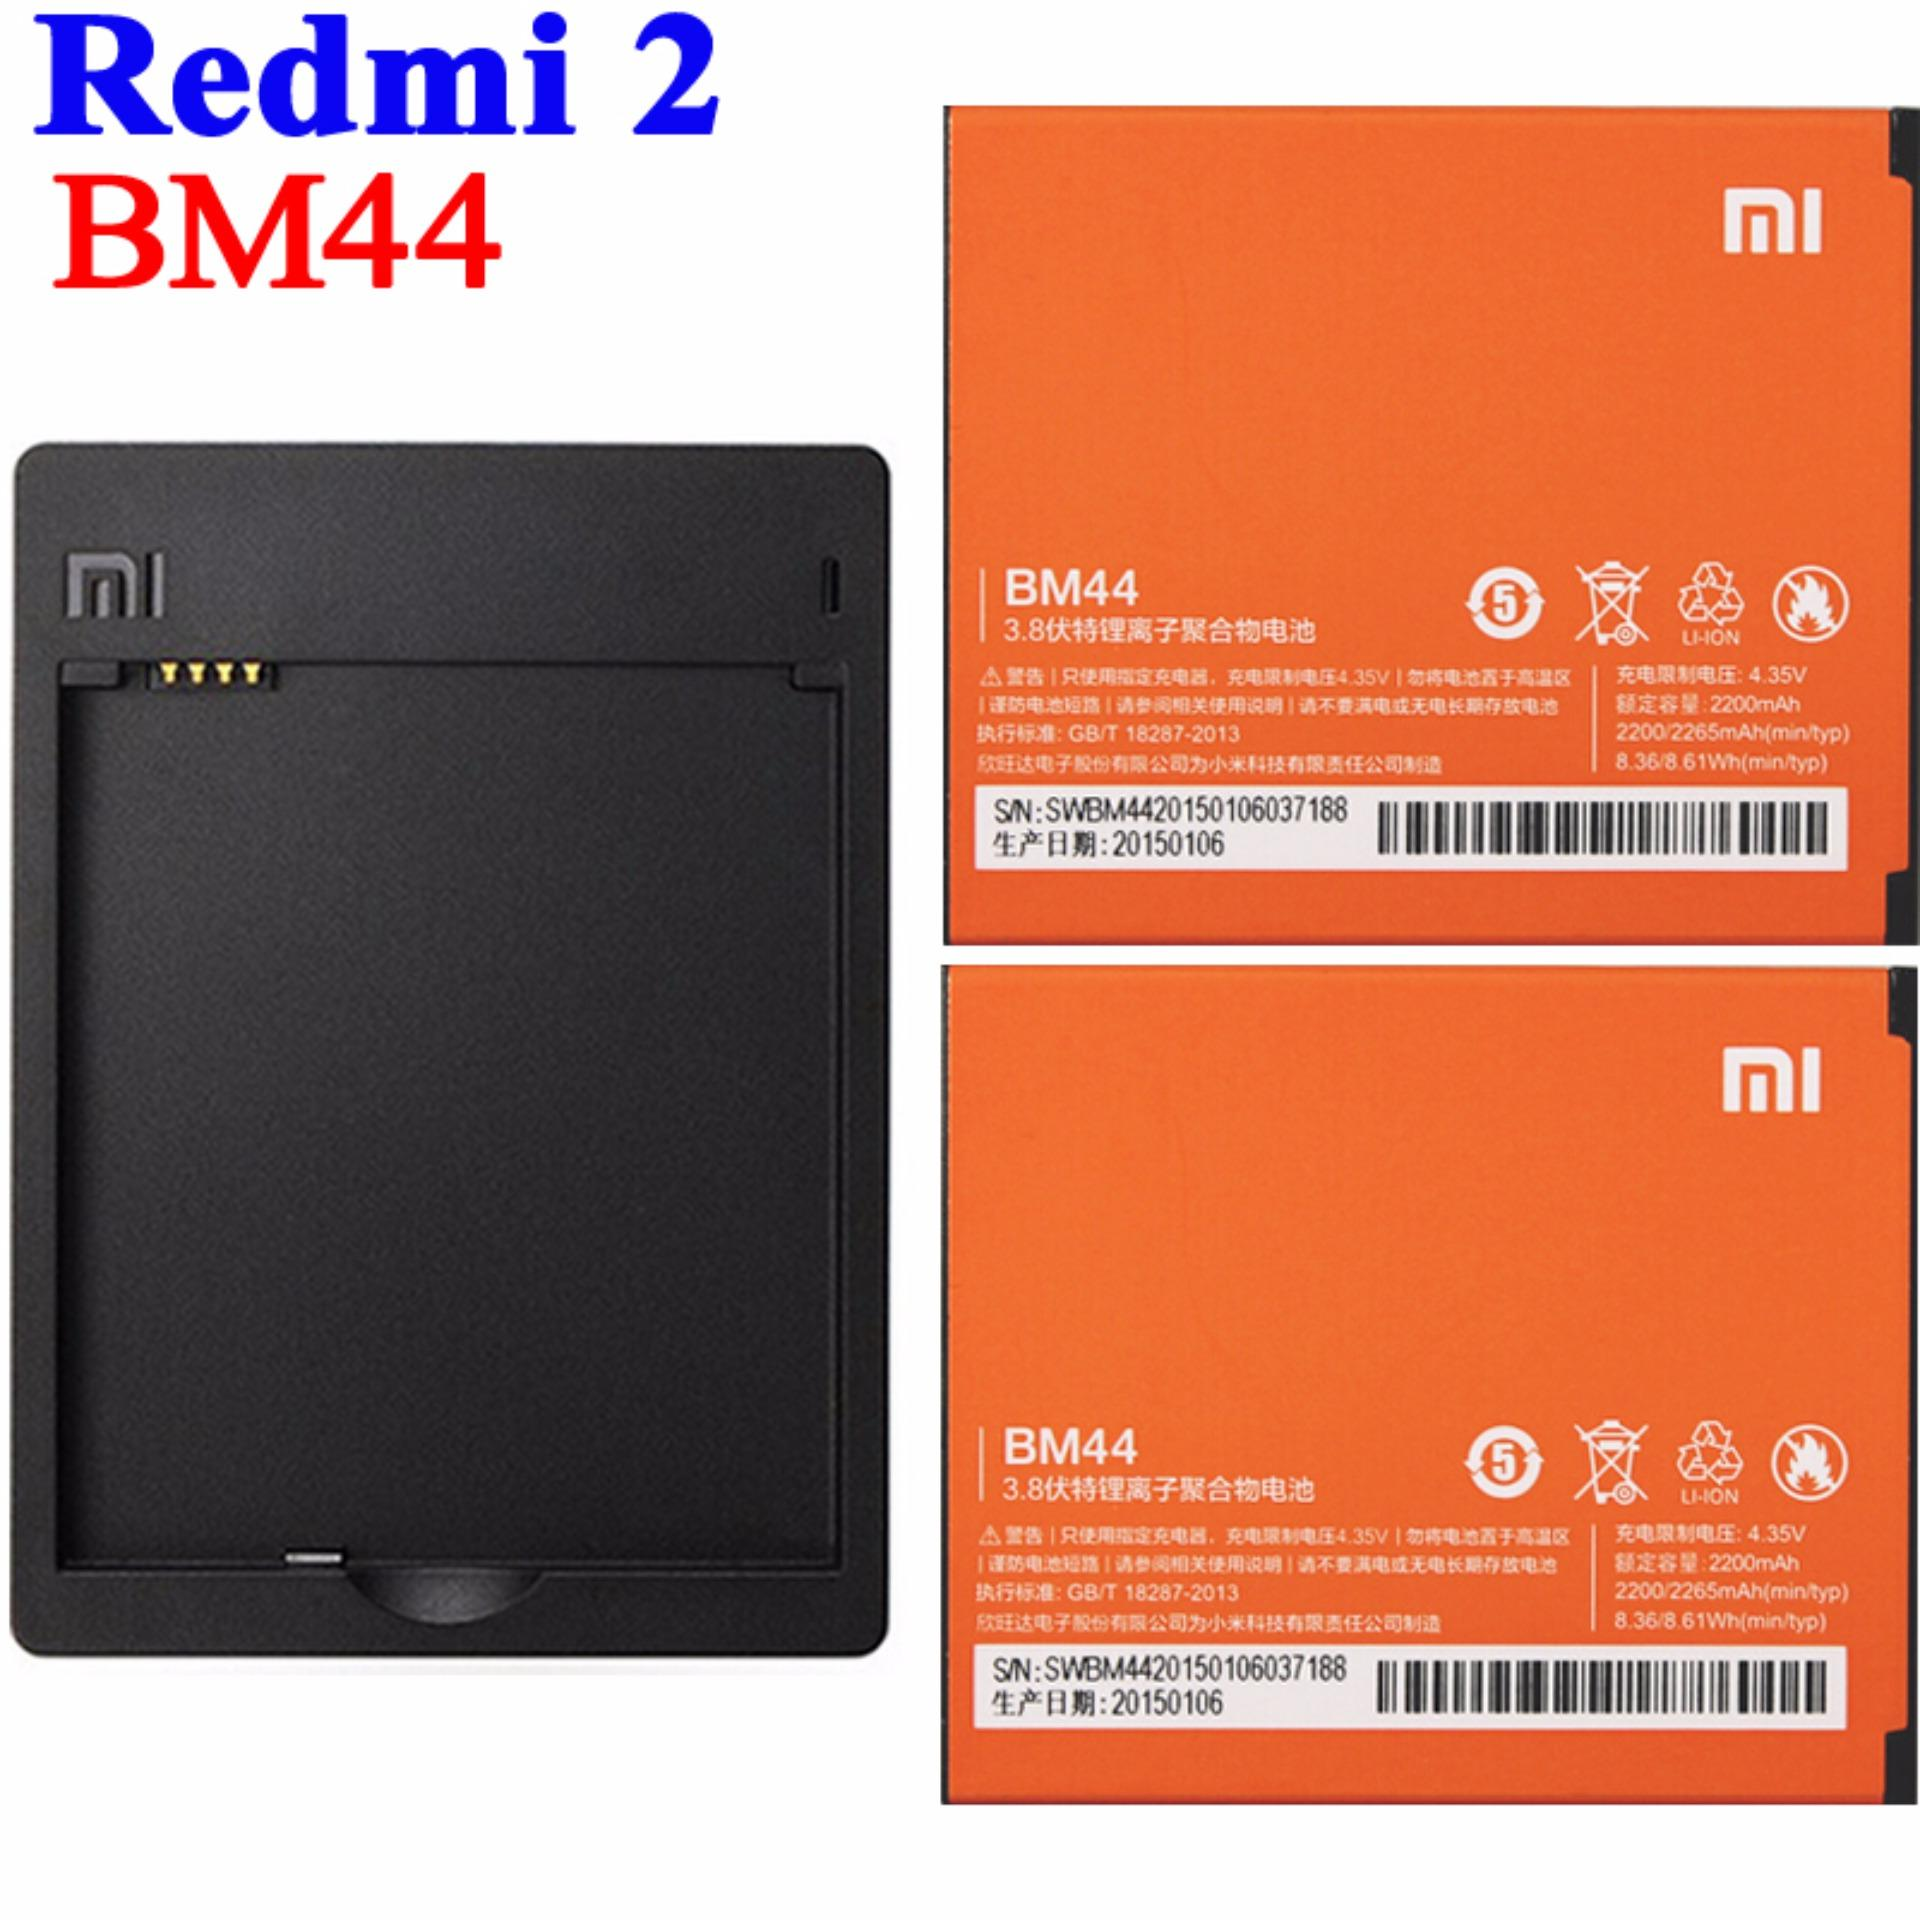 Baterai Xiomi Redmi 2 Bm 44 Original Daftar Harga Termurah Batre Battery Xiaomi 2s Prime Bm44 Batrei Batterai Xiao Mi Ori For Free Charging Dock